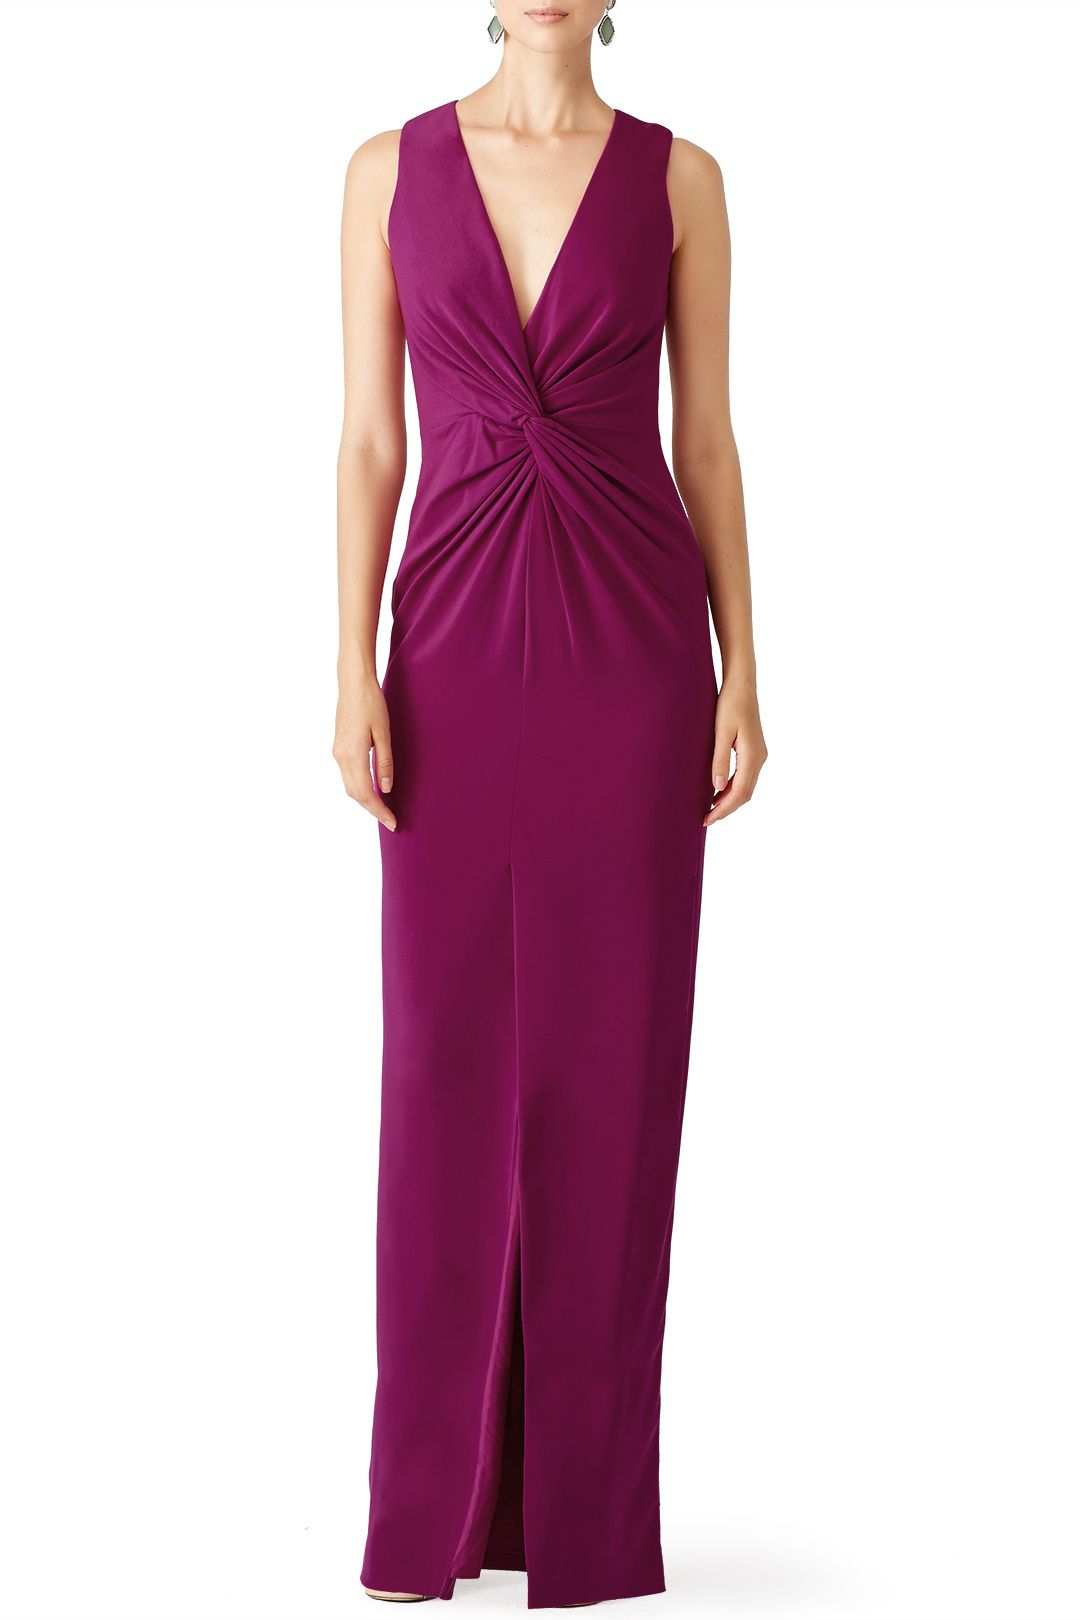 Badgley Mischka Orchid Twist Front Gown | Boo ball | Pinterest ...